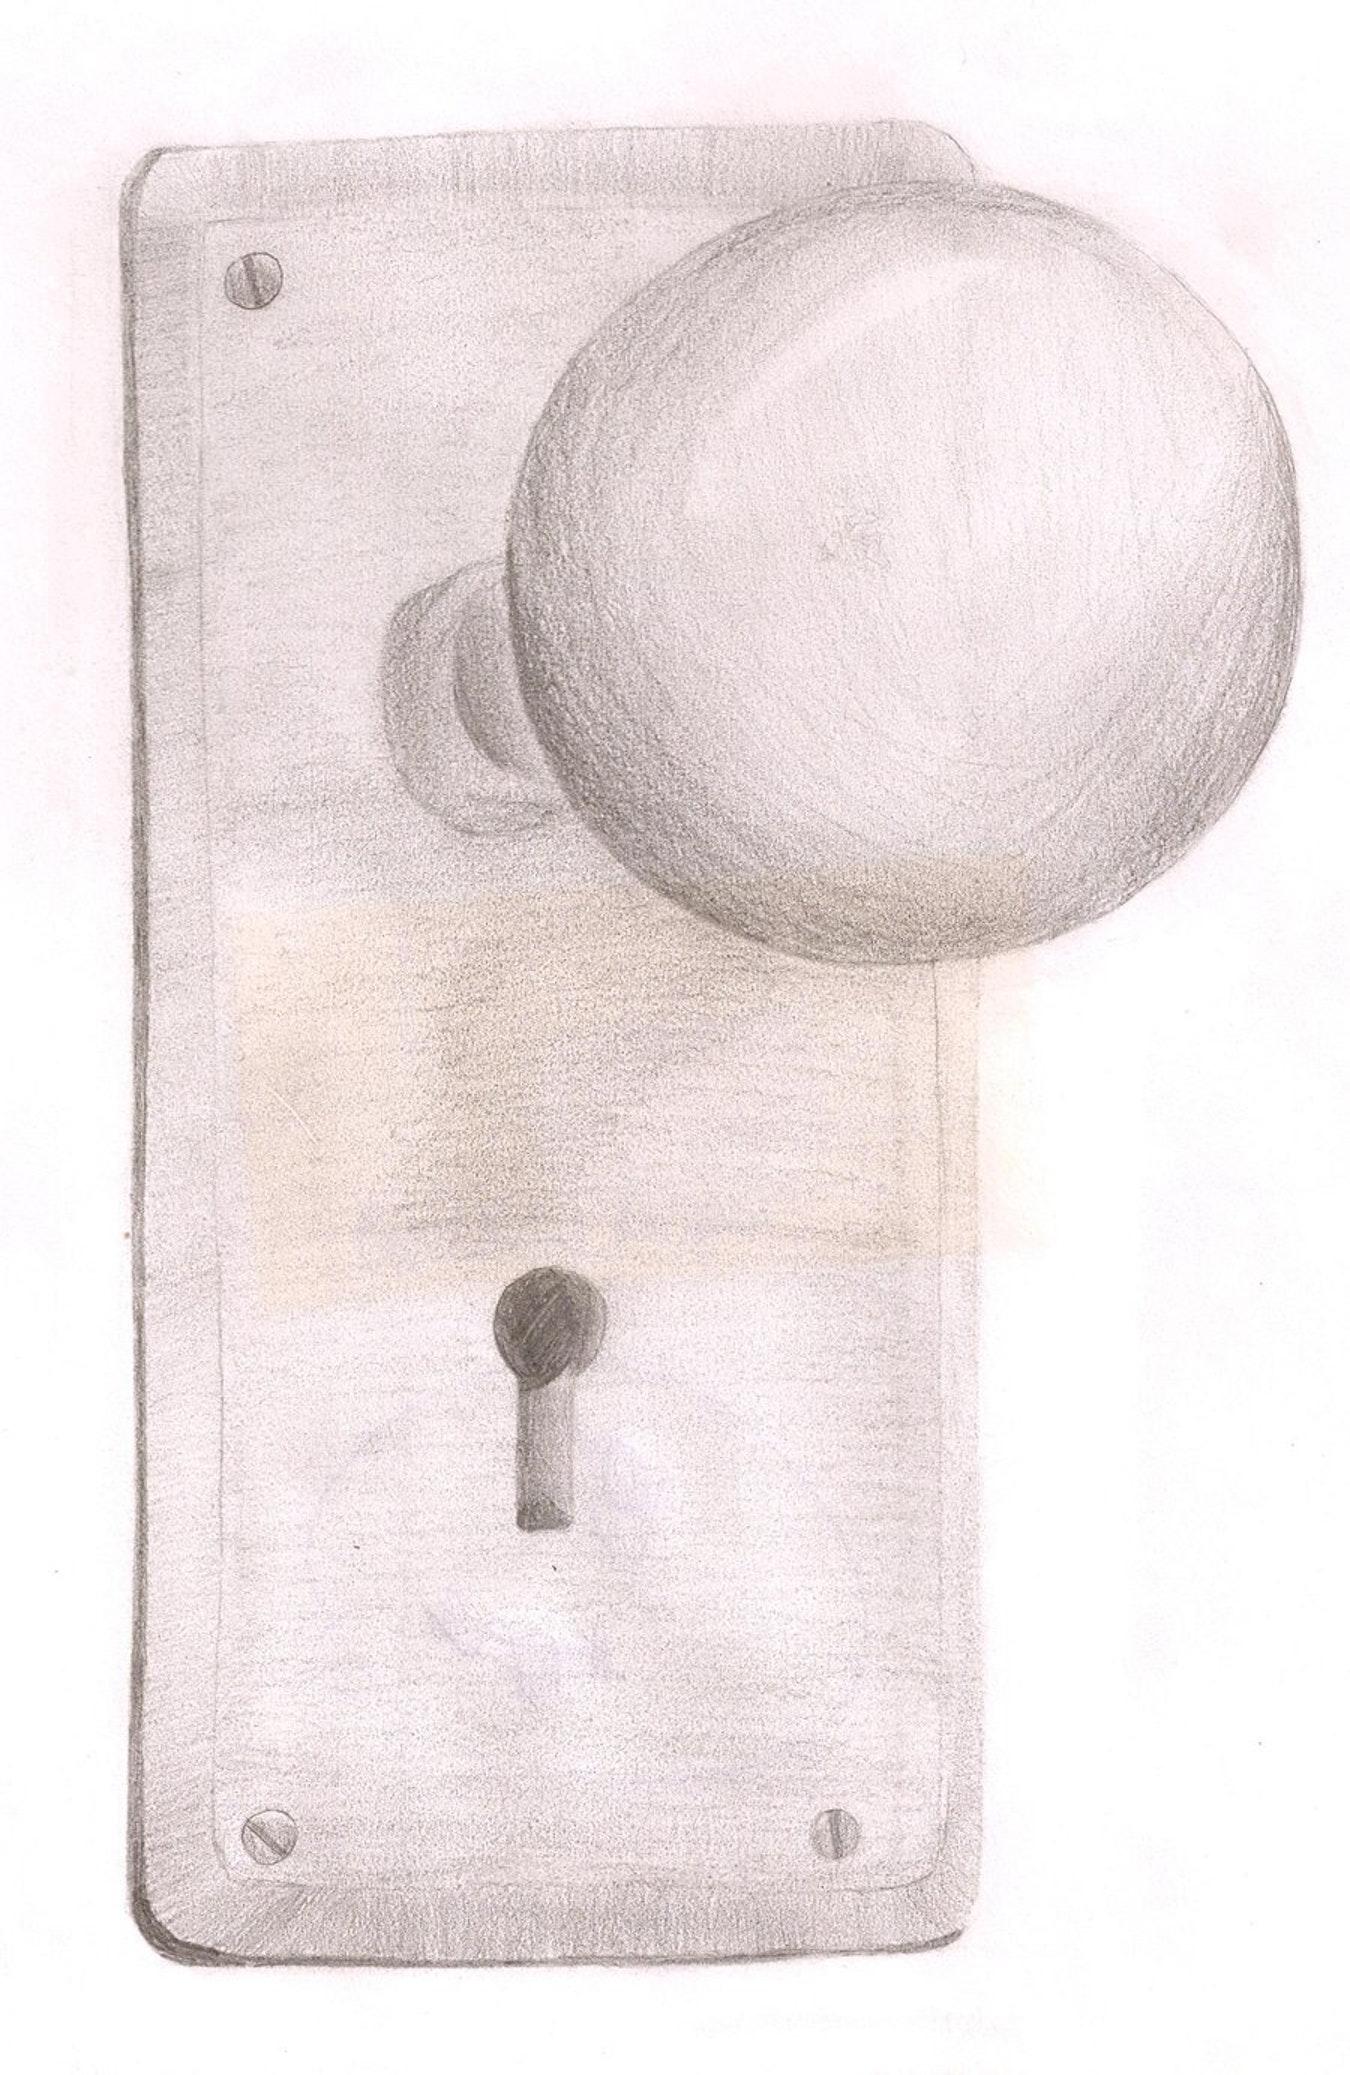 1350x2075 Drawing Door Knob Still Cat Girl28 Creative Portrait 12